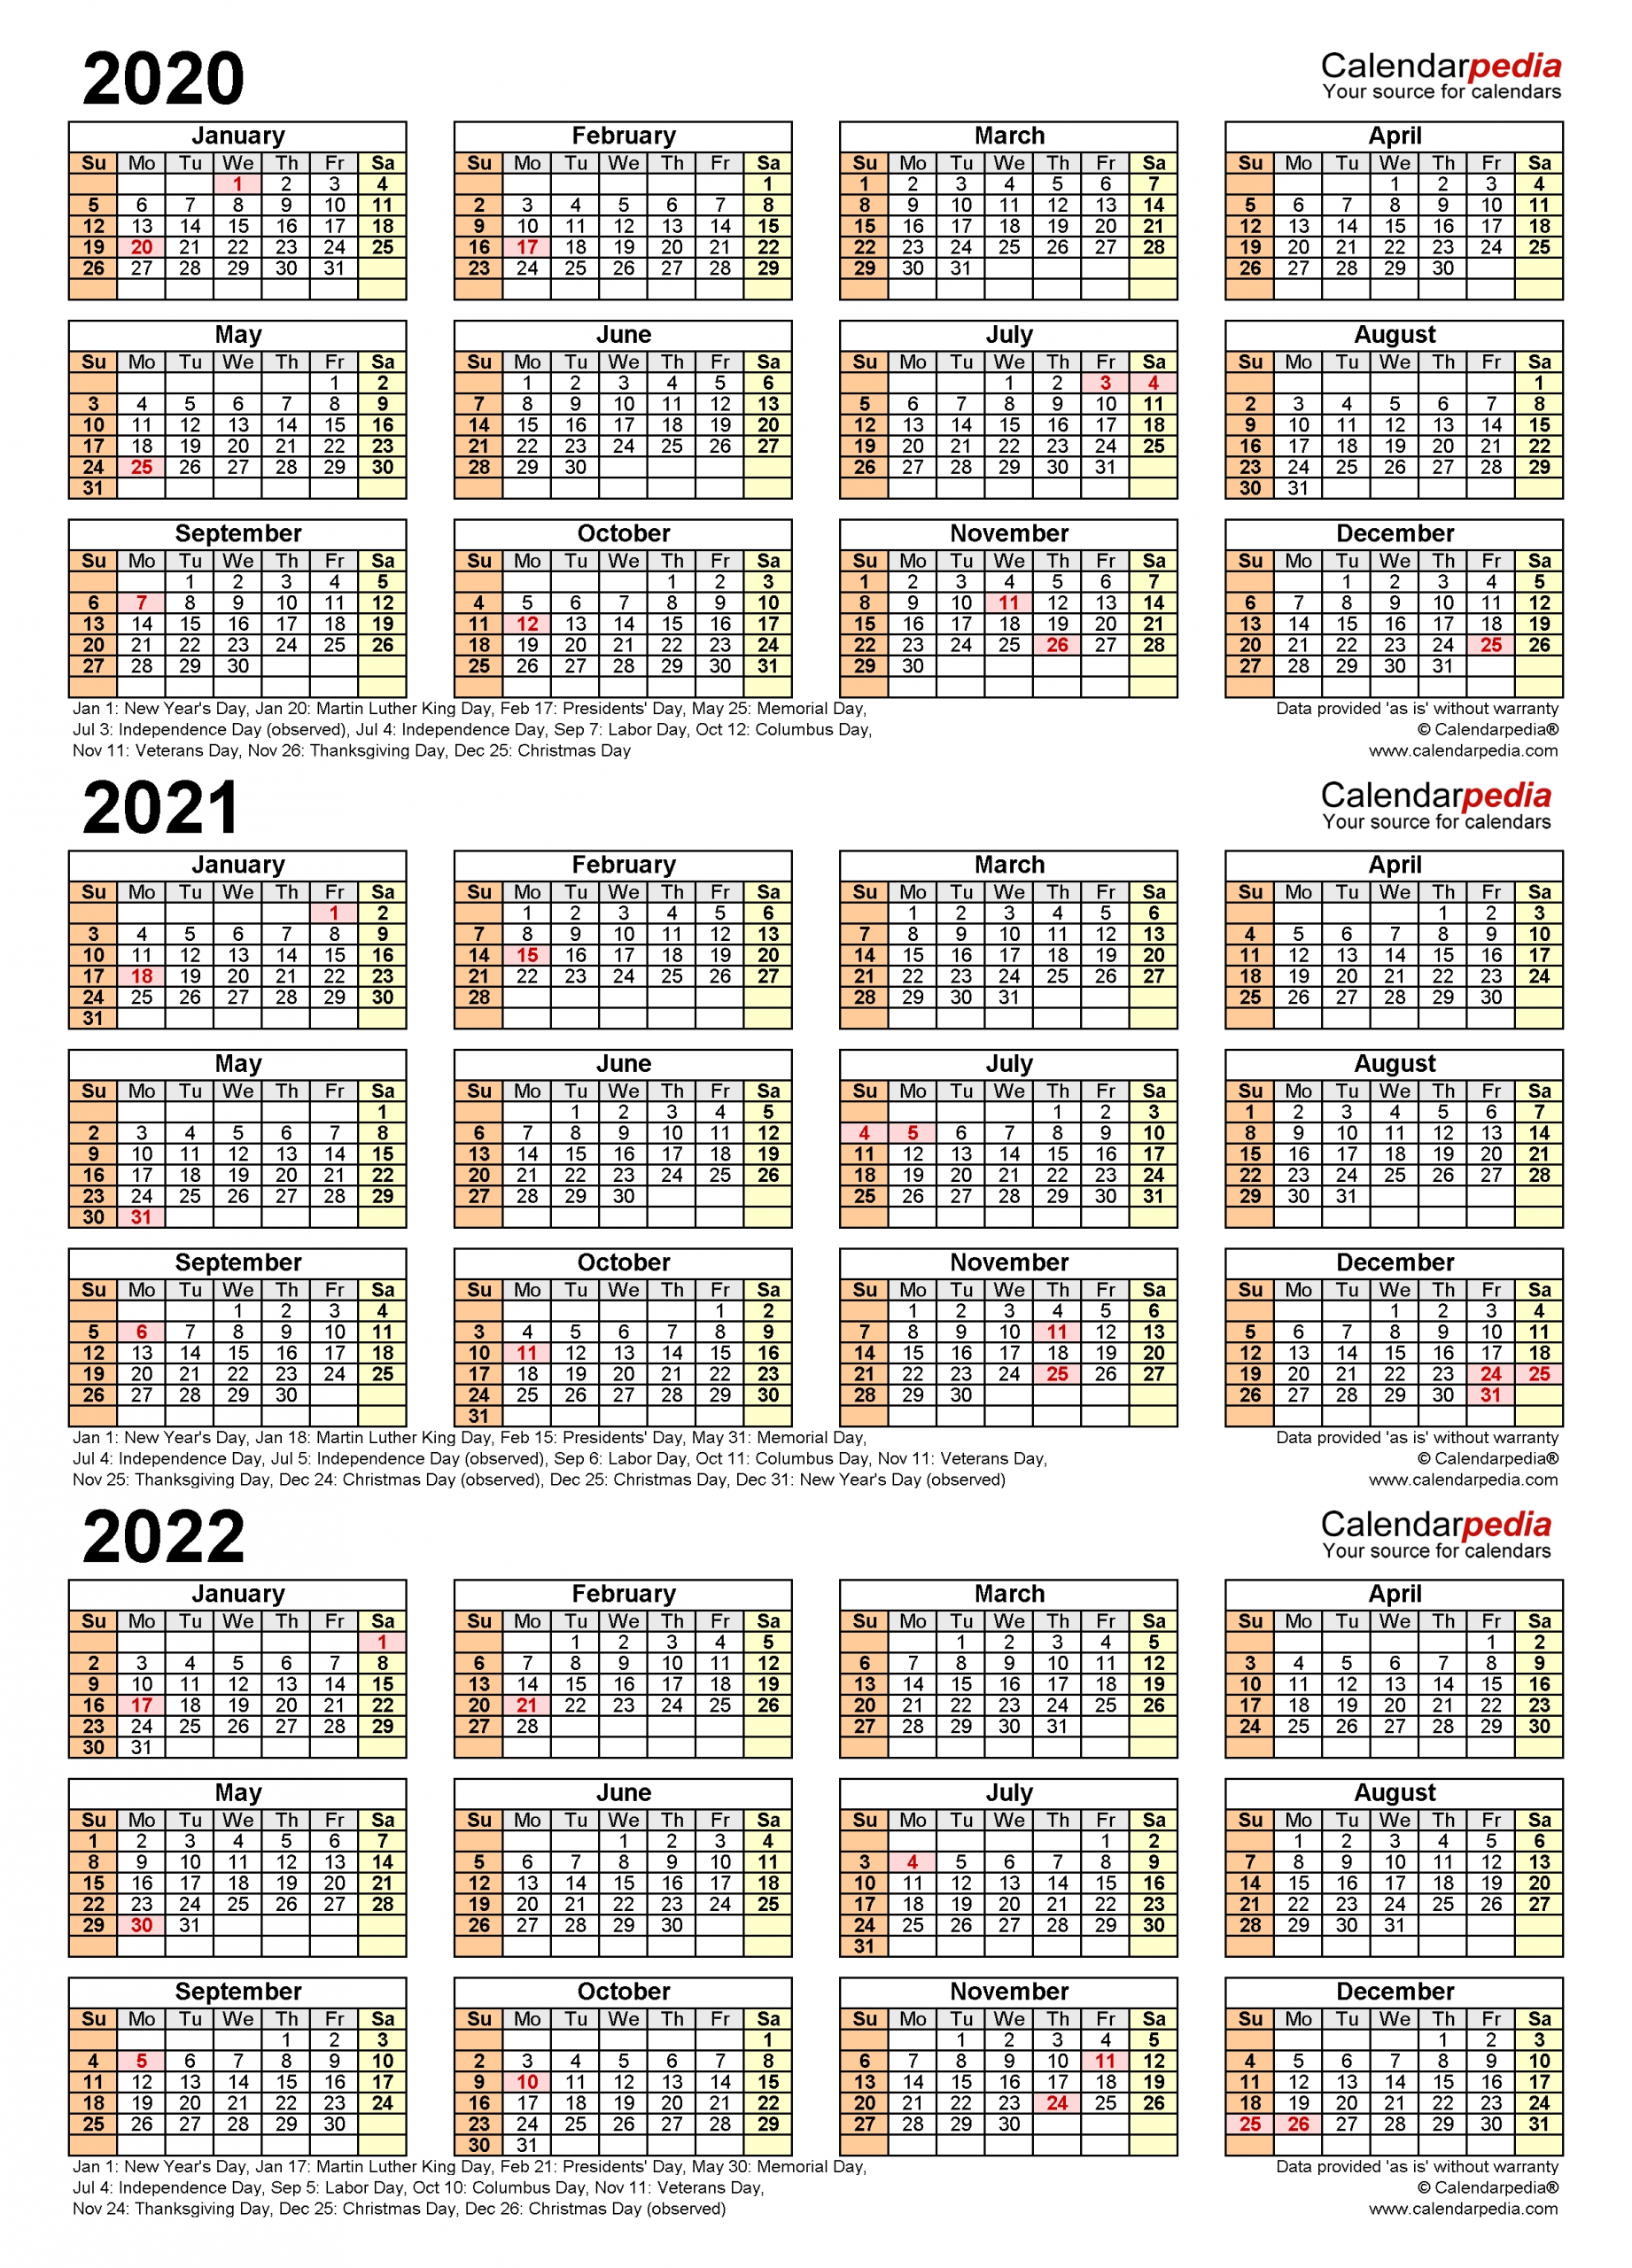 2020-2022 Three Year Calendar - Free Printable Excel Templates-3 Year Calendar 2021